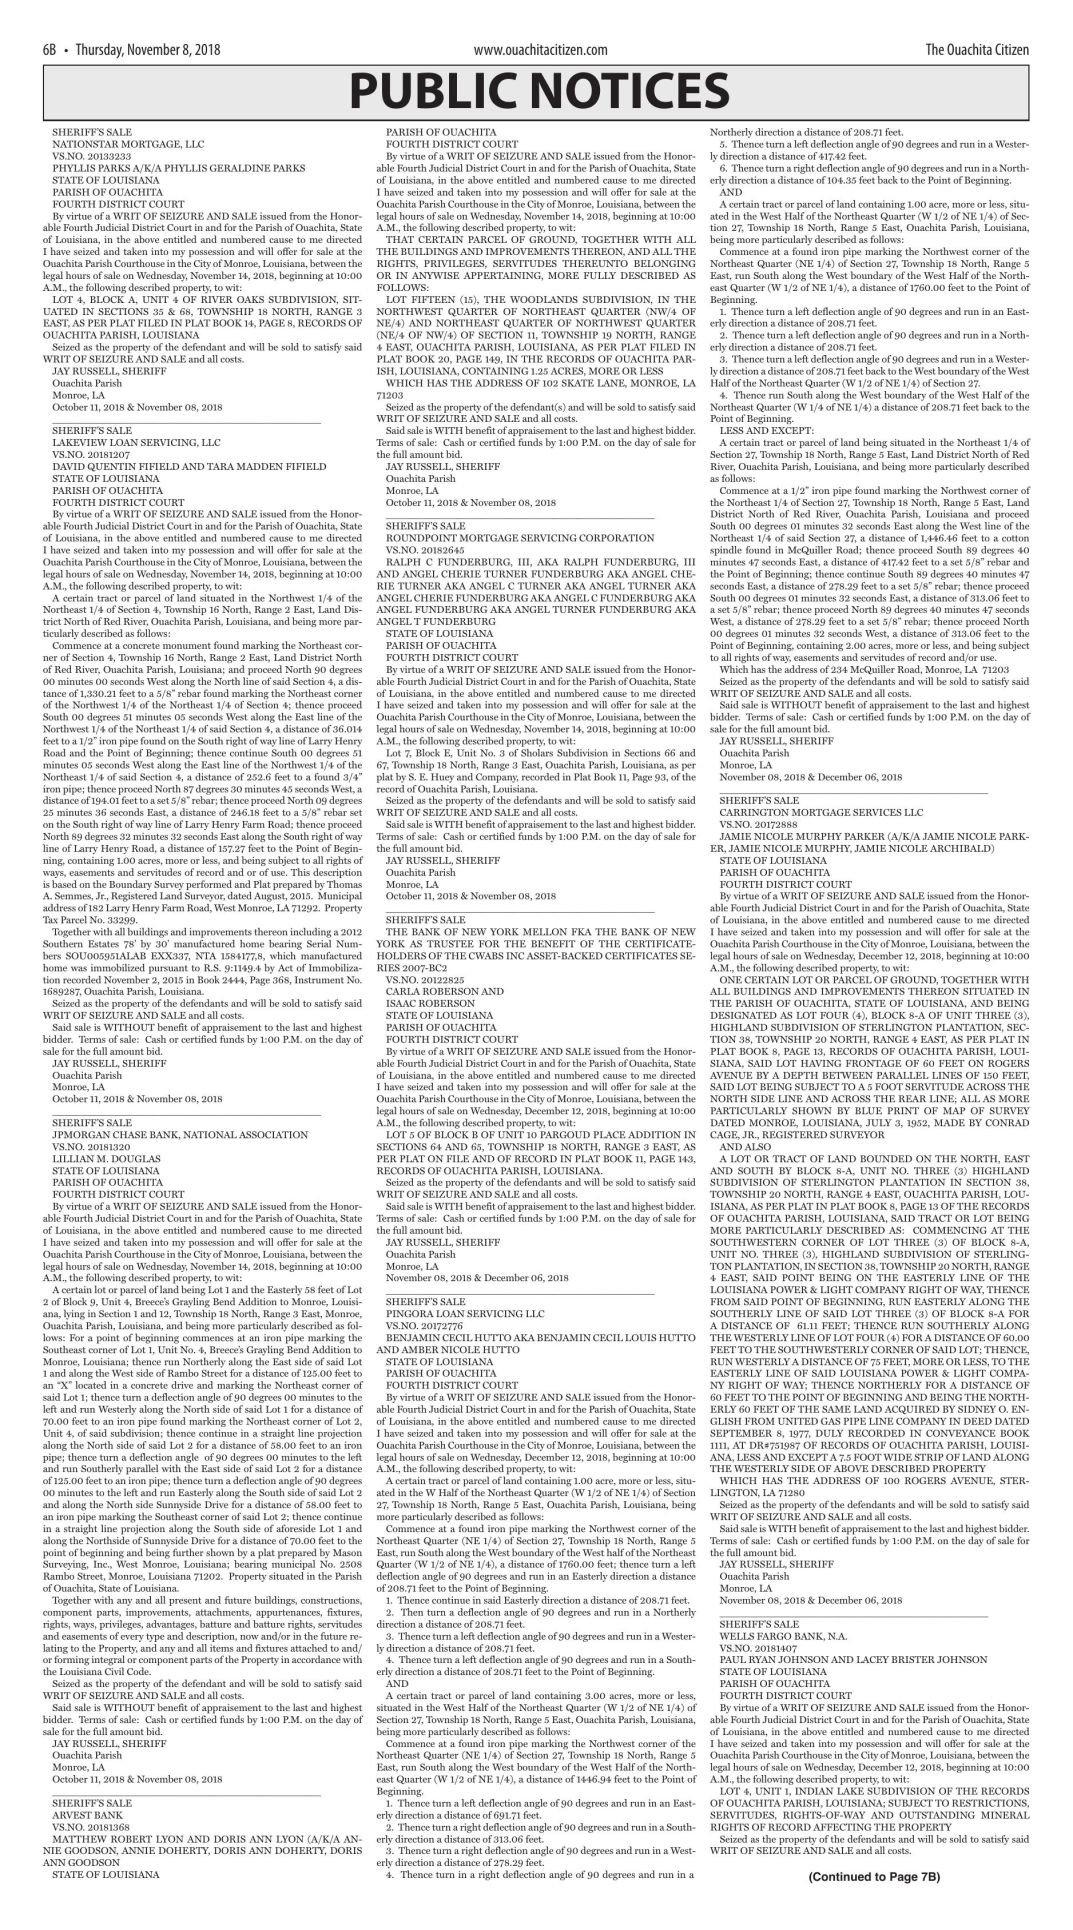 Nov. 8, 2018 Public Notice, click to download pages